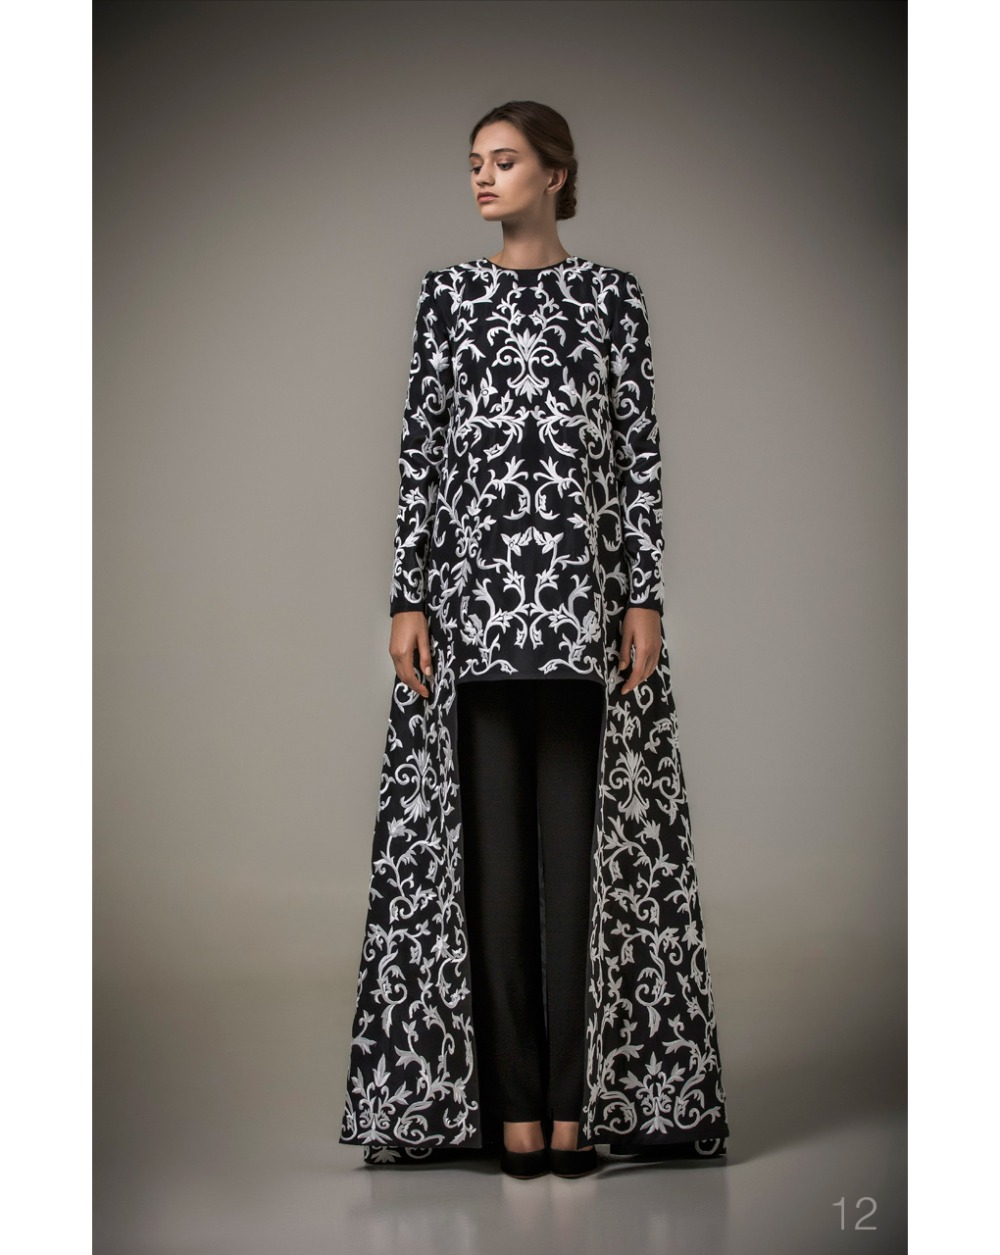 satin robe pantalon achetez des lots petit prix satin robe pantalon en provenance de. Black Bedroom Furniture Sets. Home Design Ideas